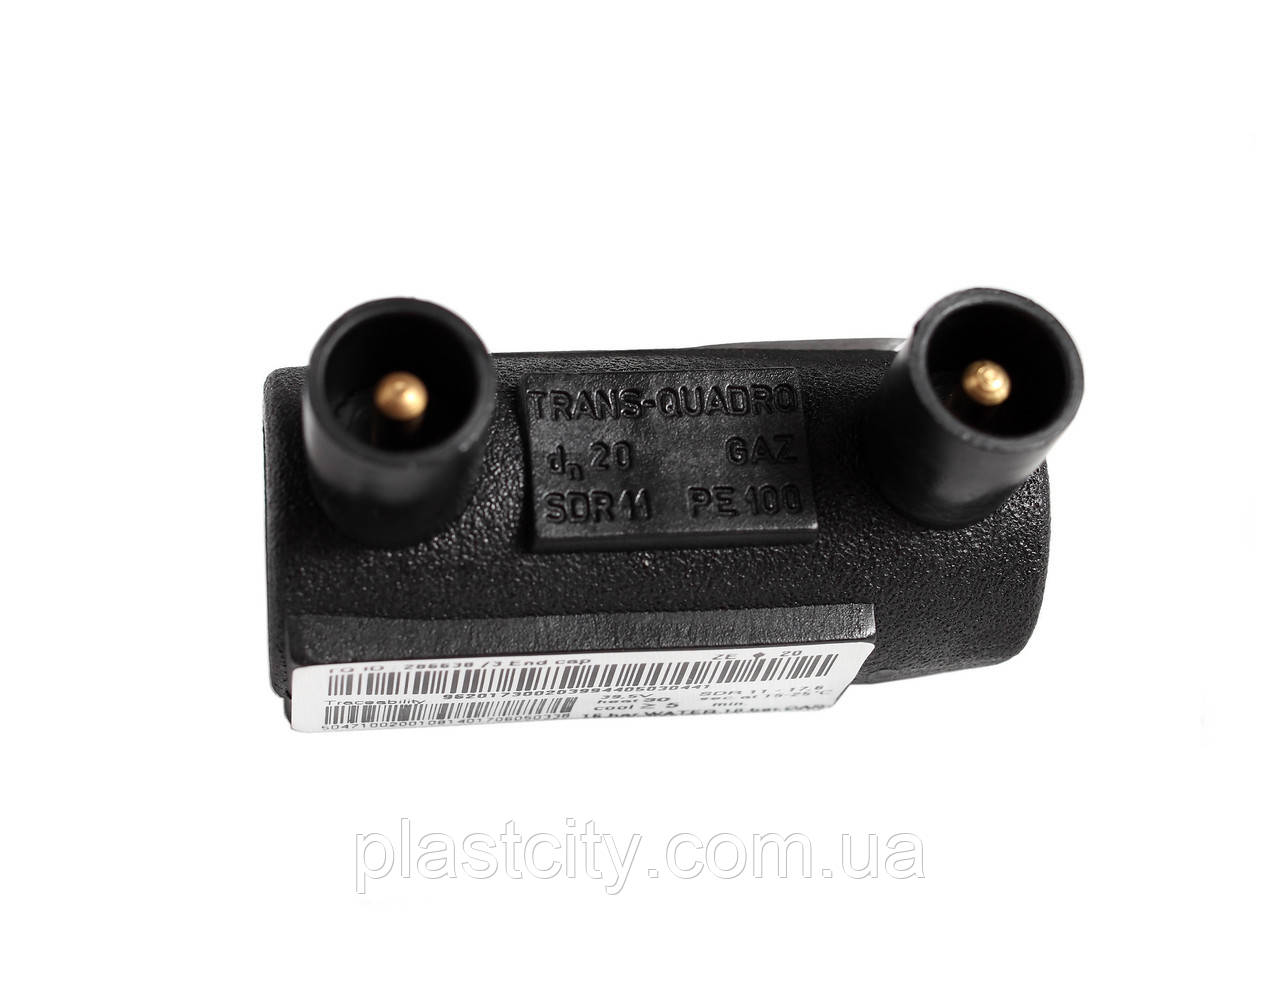 Муфта терморезисторная 63 мм ПЭ100 SDR11